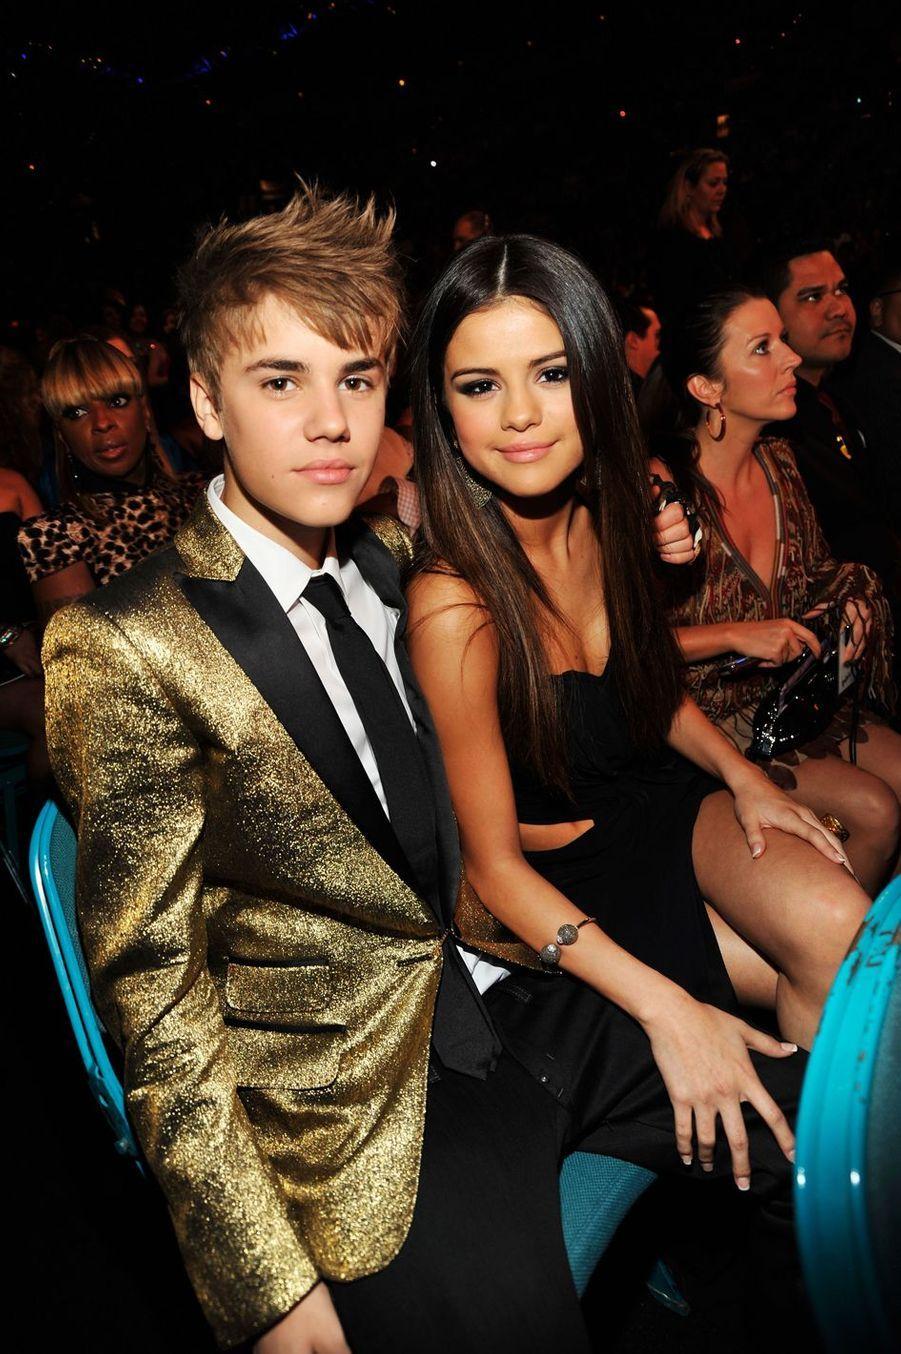 Avec Selena Gomez lors des Billboard Music Awards en mai 2011 à Las Vegas